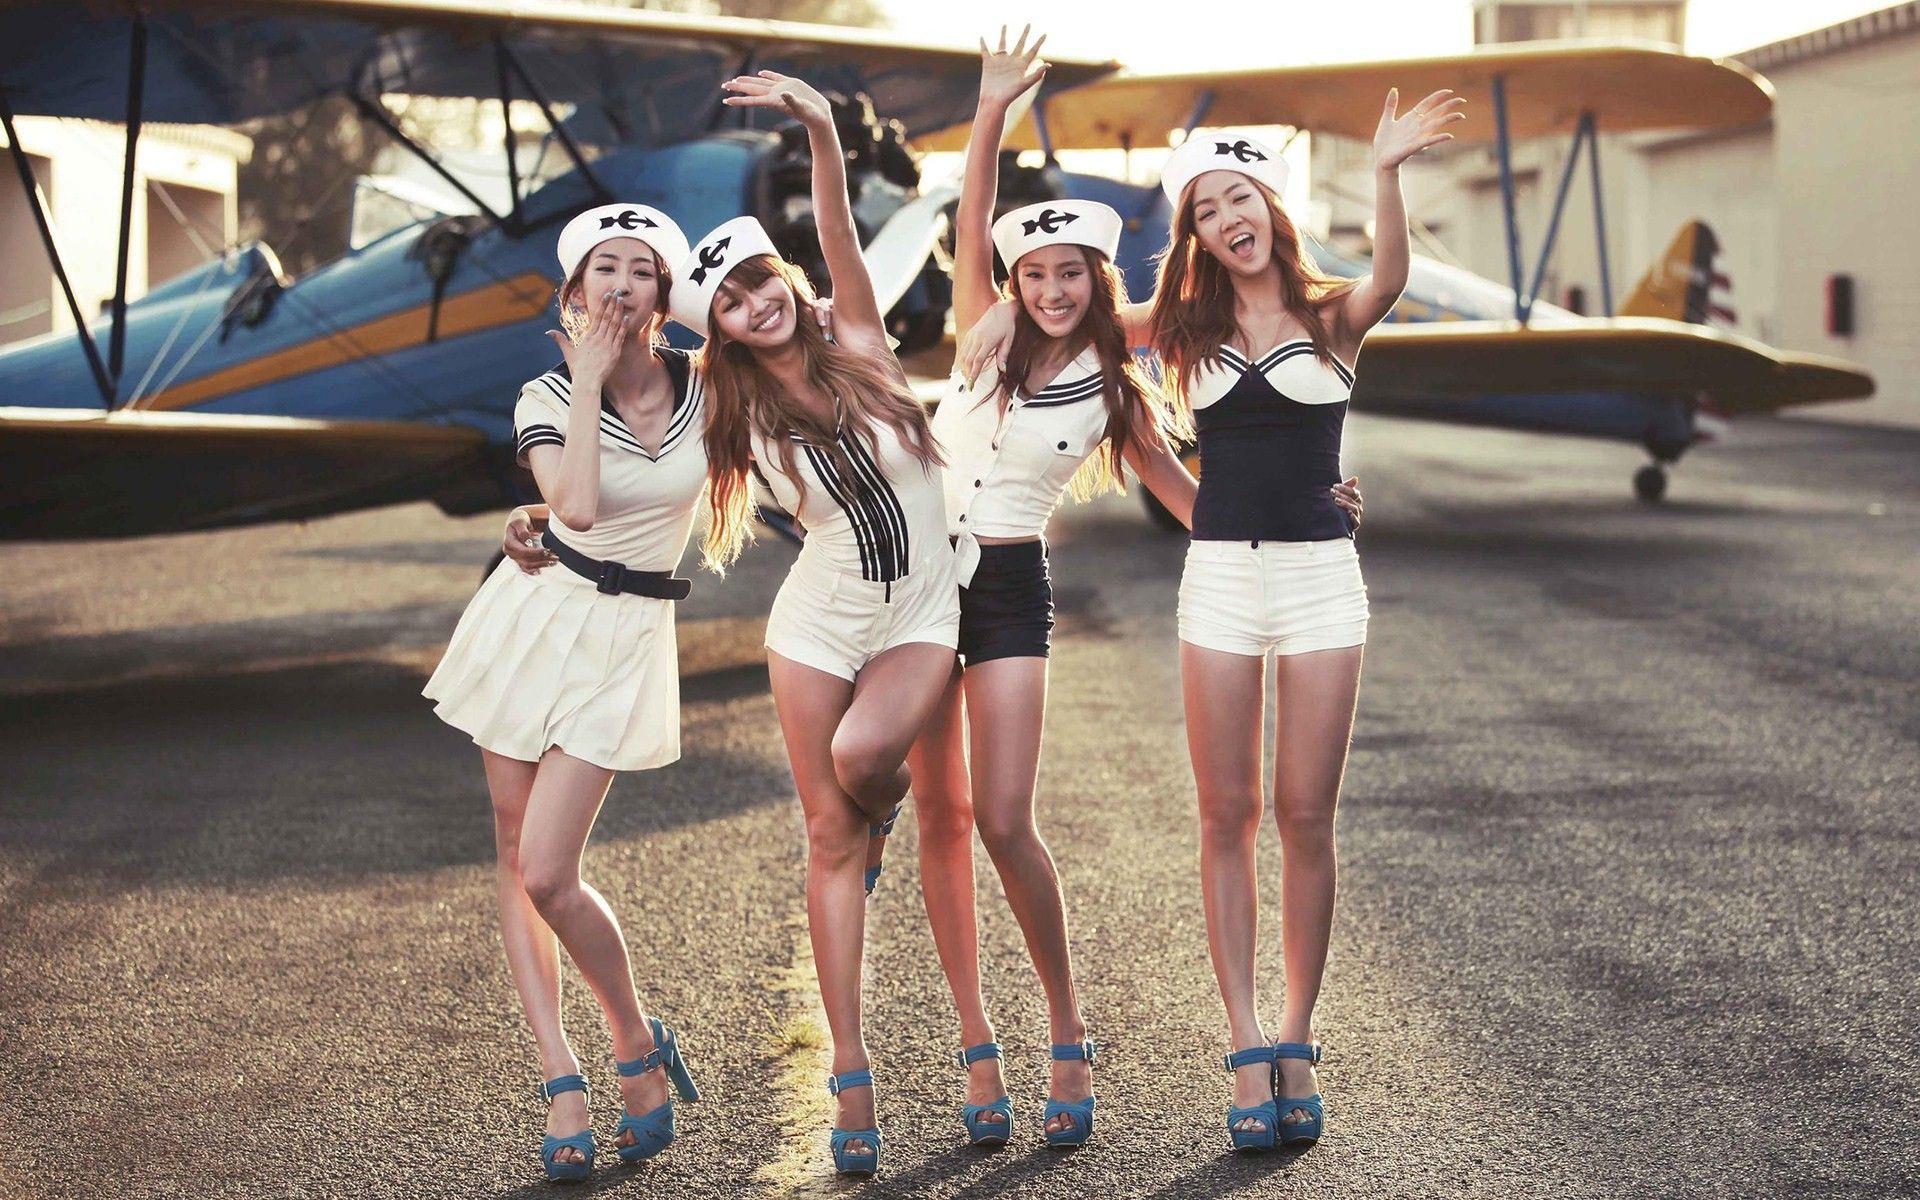 Women Aircraft Asians Korean K Pop Aviation Sistar Dressed Soyou Hyorin Bora Dasom Wallpaper 1920x1200 213269 Sistar Sistar Kpop Korean Girl Band